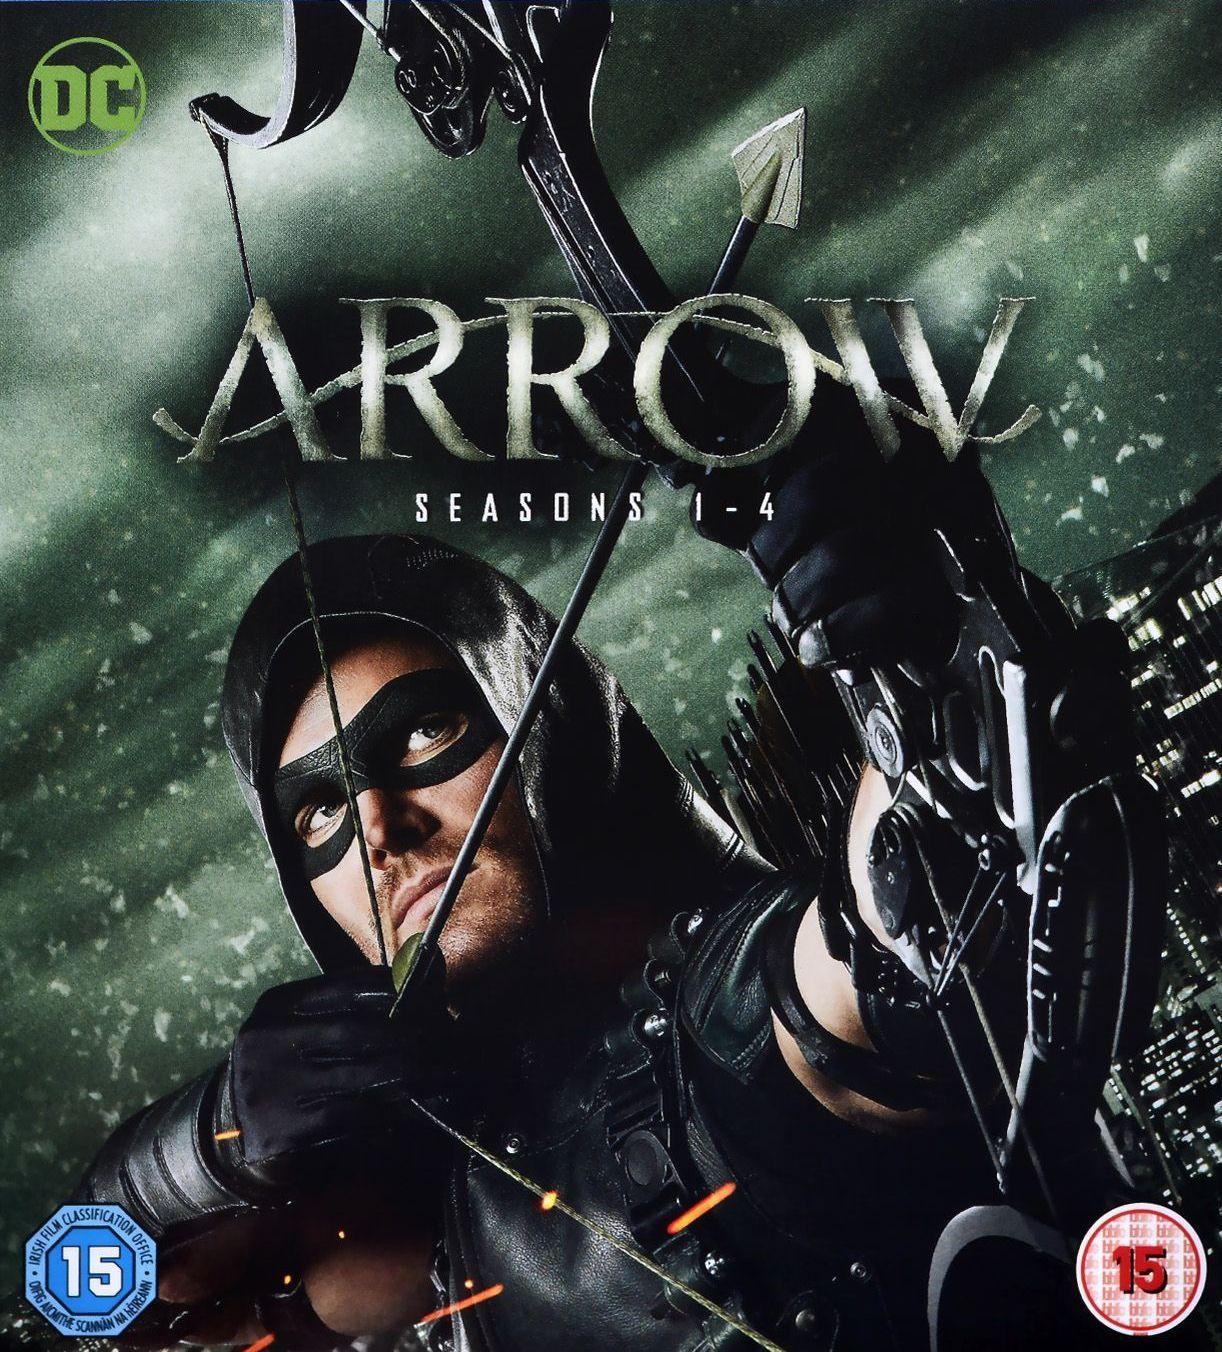 Arrow Season 1-4 (Blu-Ray) - 1